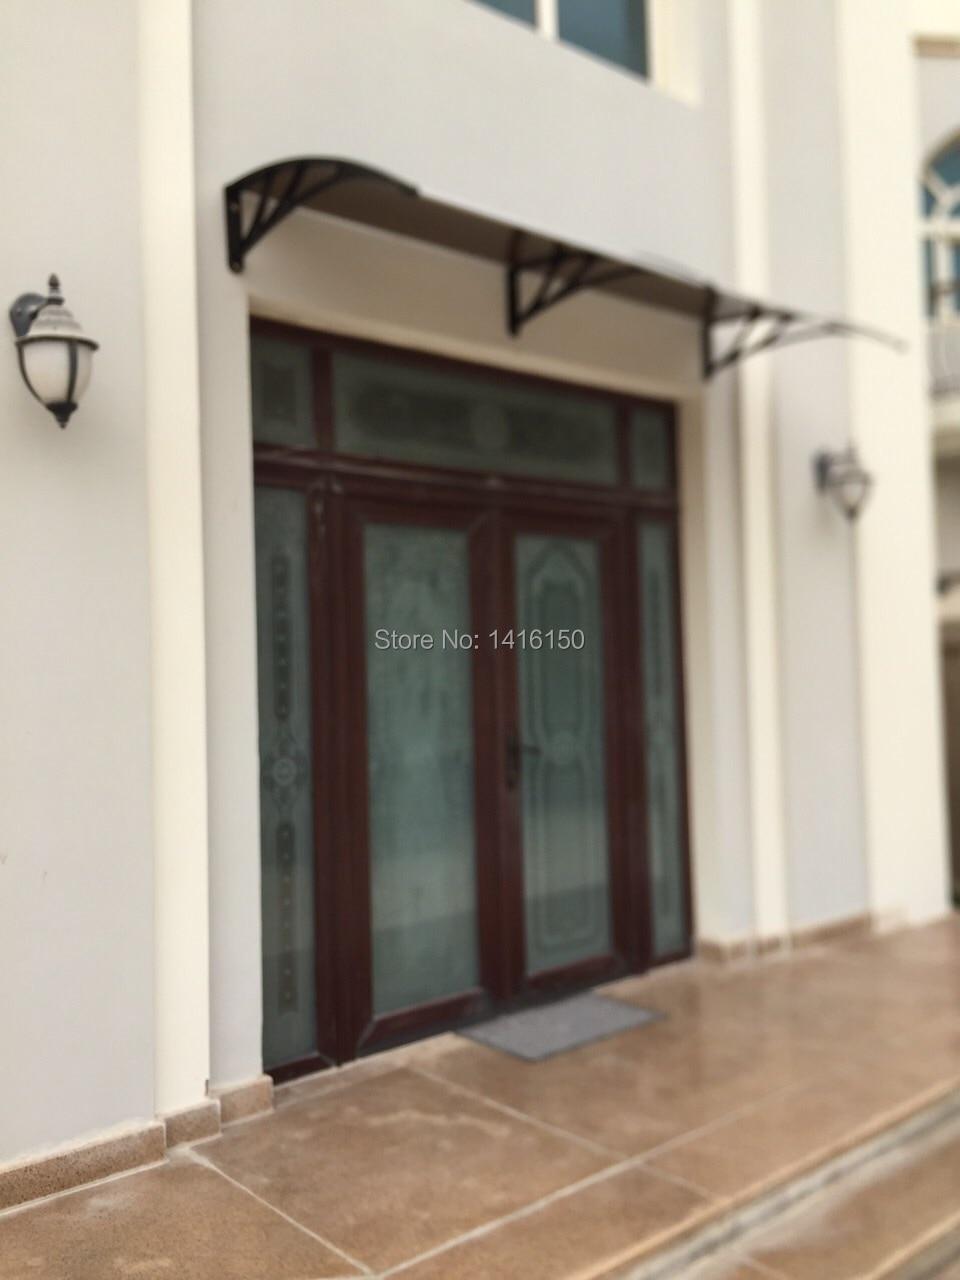 DS120200 P,120x200cm,Depth 120cm,Width 200cm,Entry Door Side Door Window  Polycarbonate Awning With Engineering Plastic Bracket In Awnings From Home  U0026 Garden ...